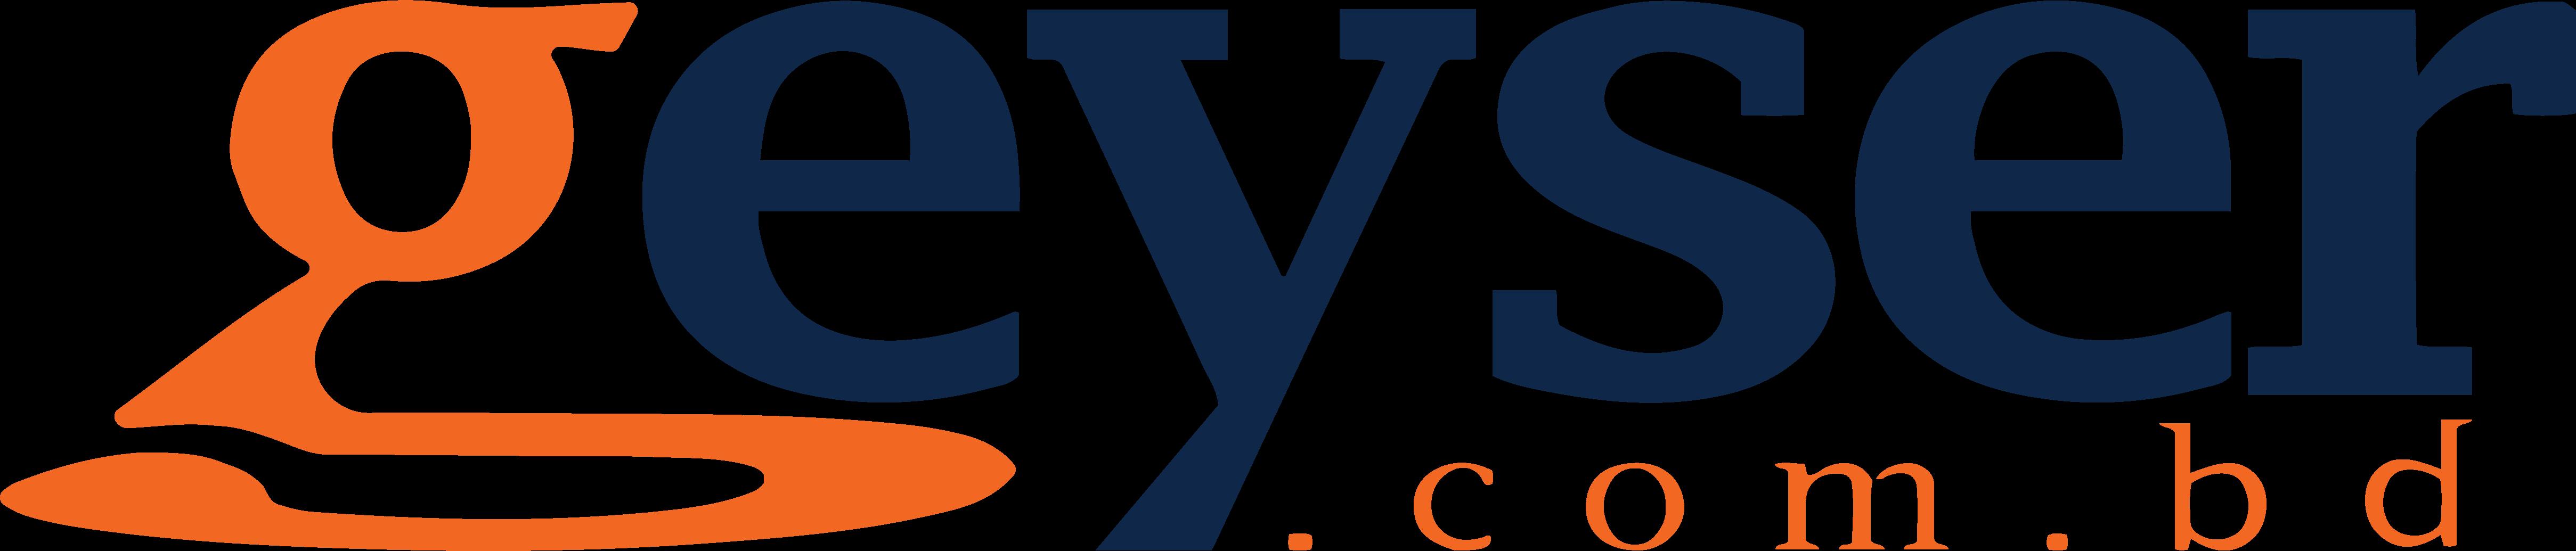 Geyser.com.bd Logo